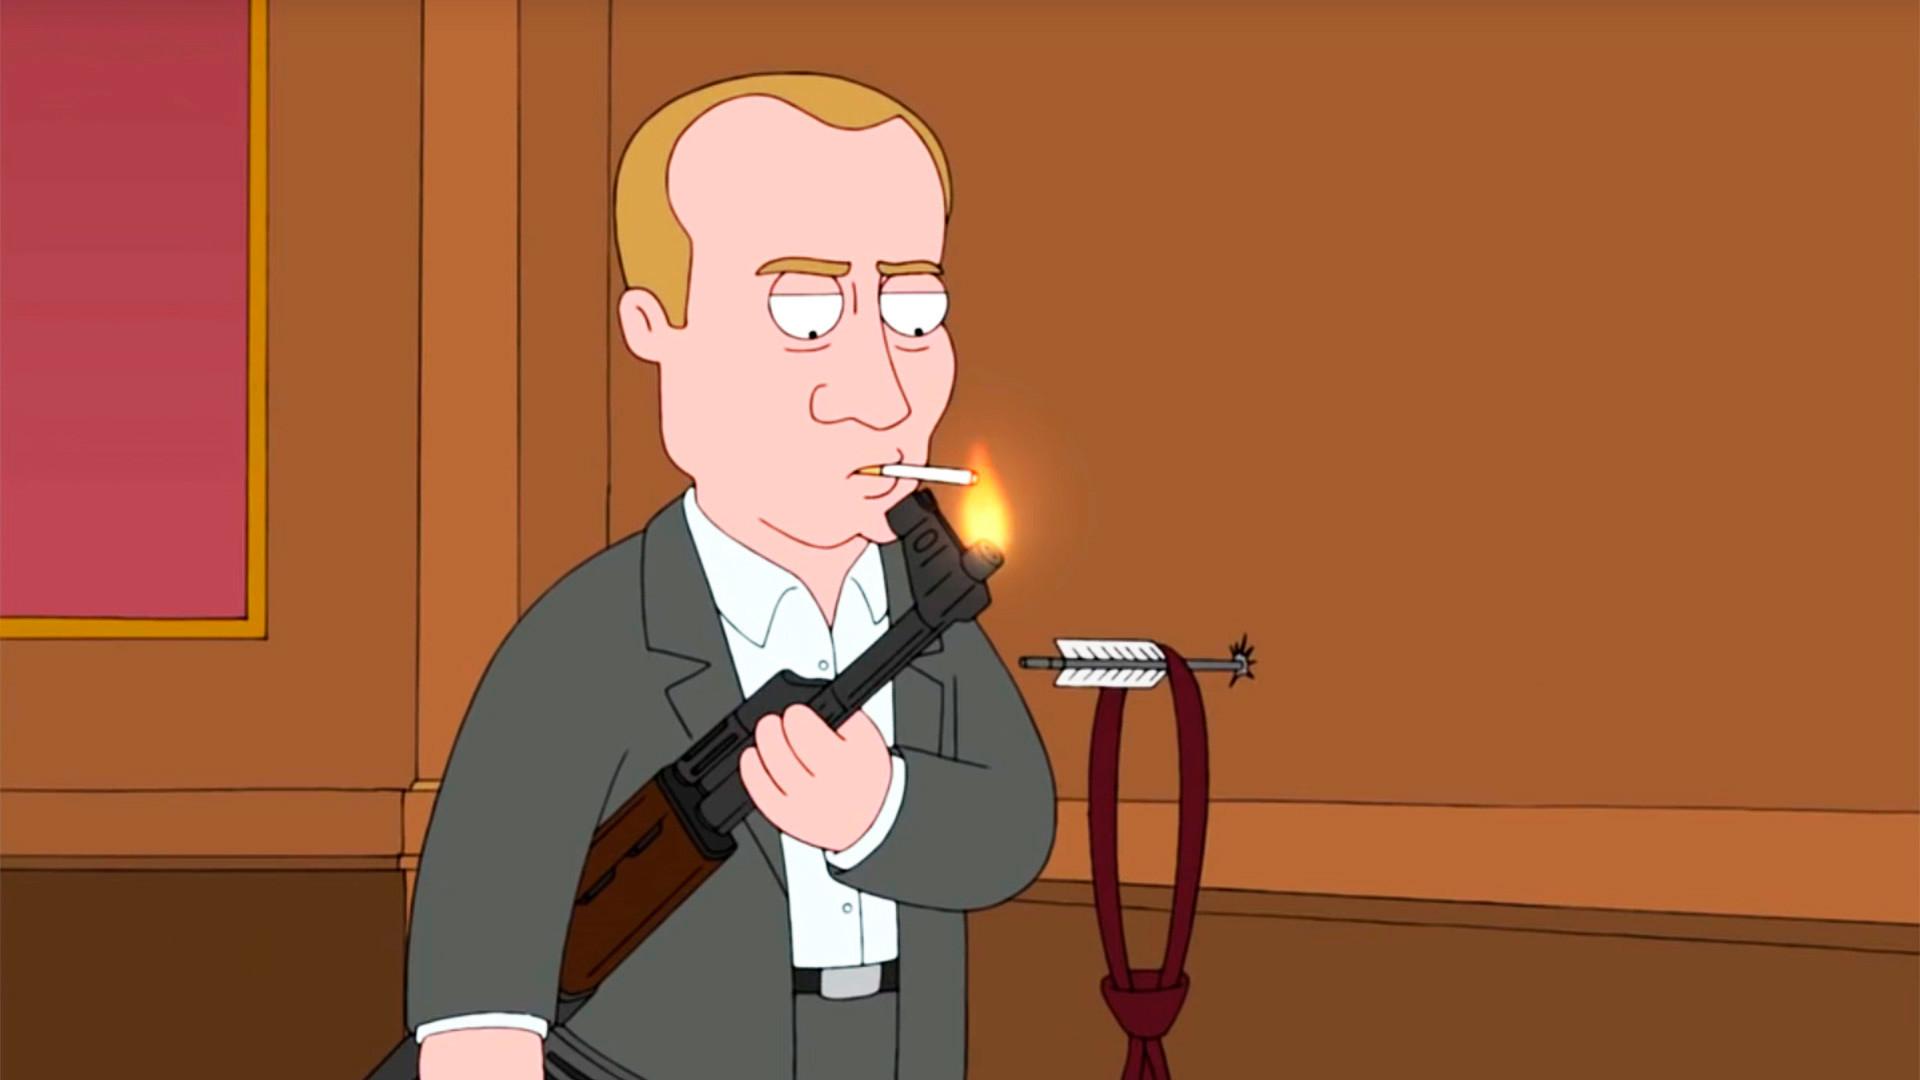 Putin u seriji Family guy